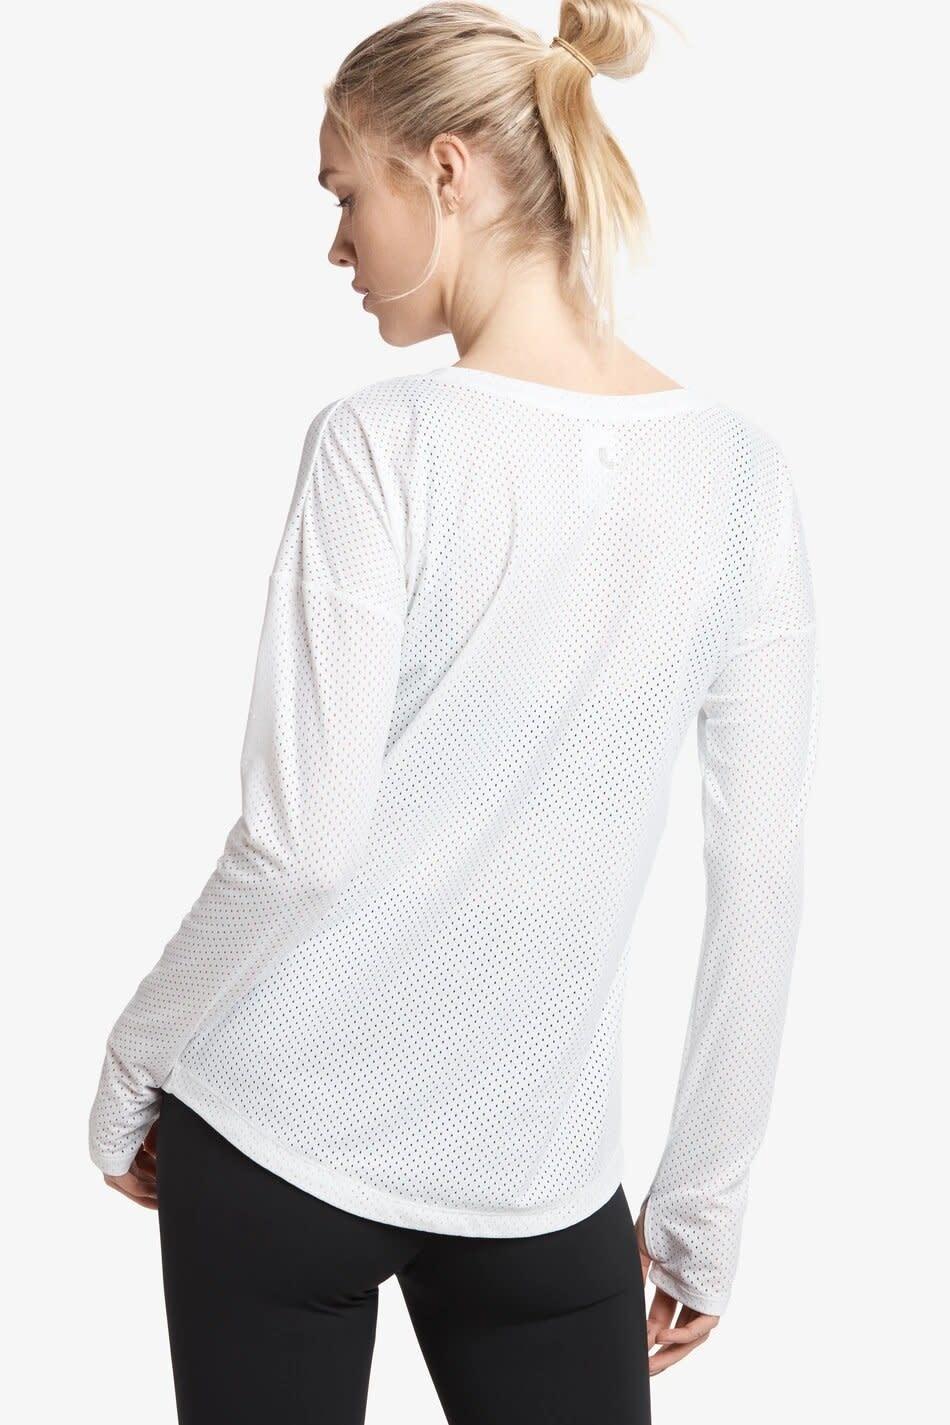 Lole Venture Long Sleeve - White